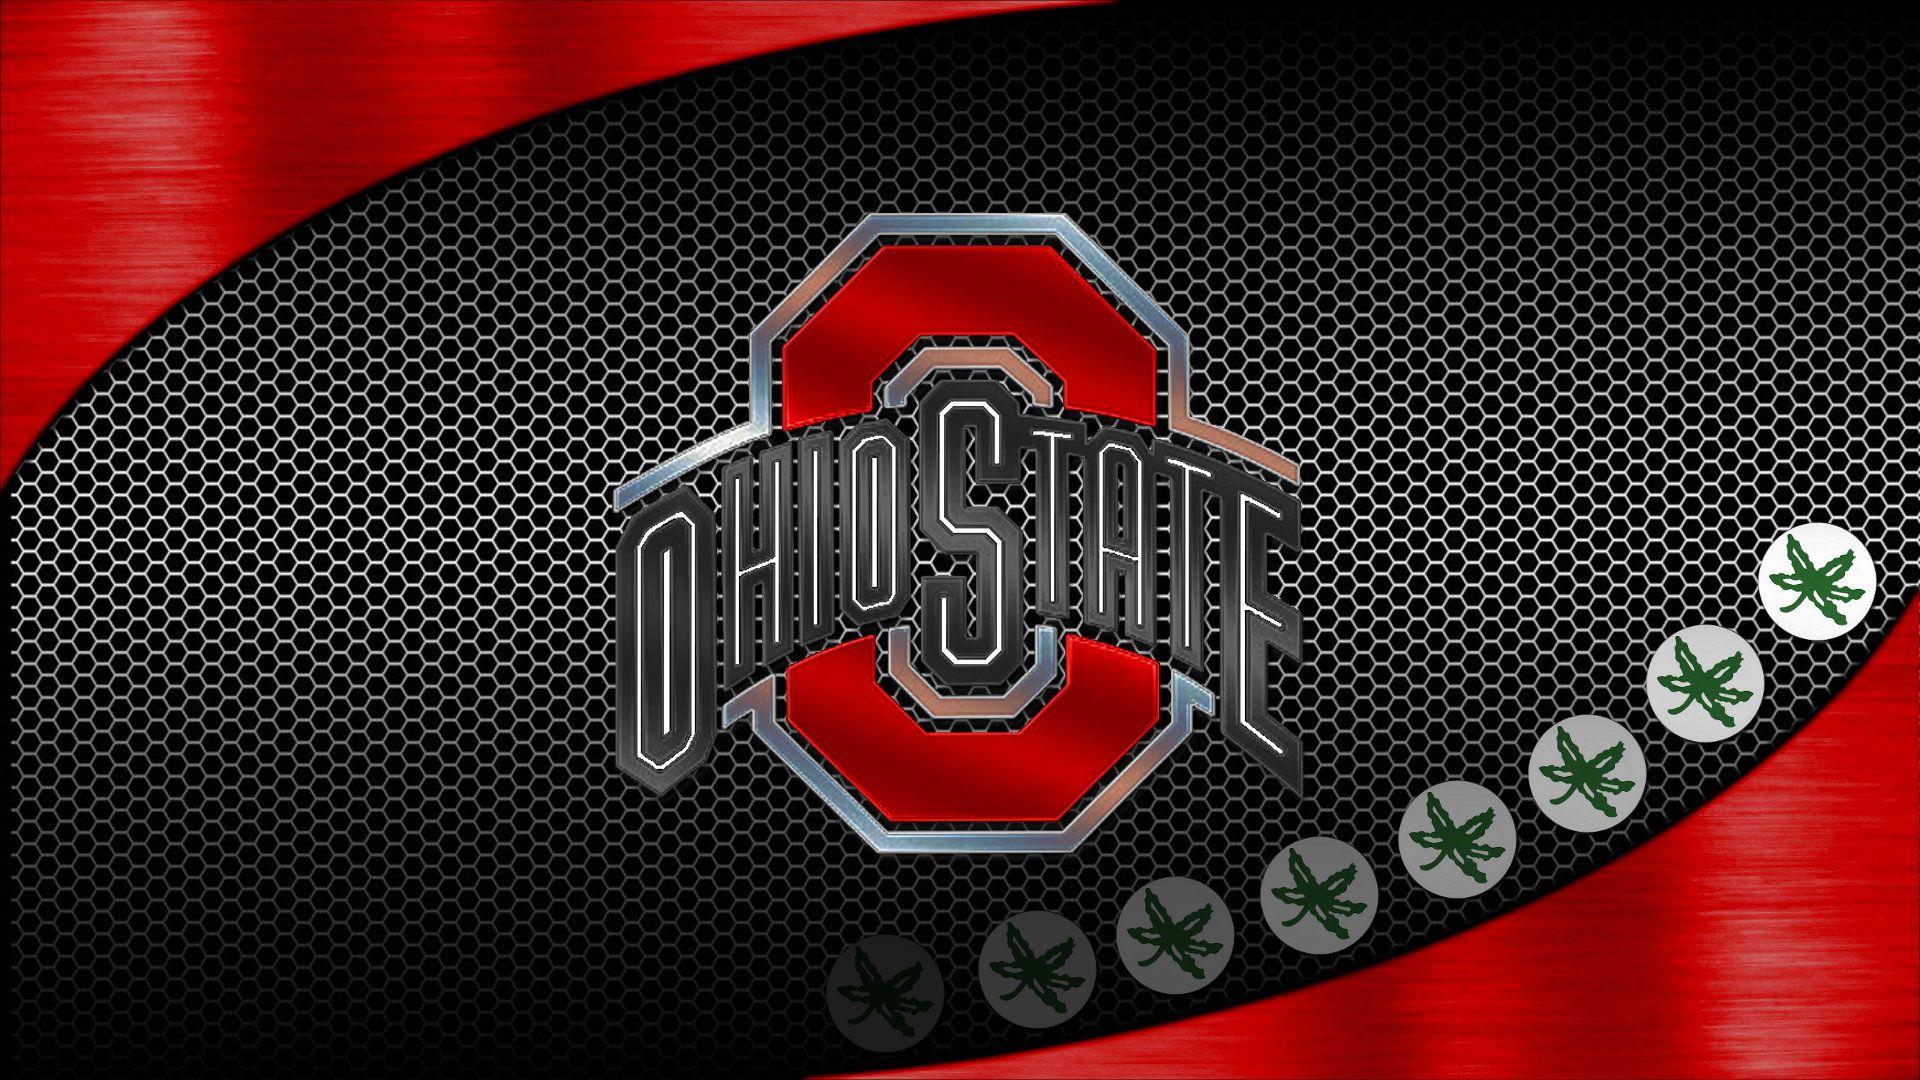 OSU Wallpaper 532 Ohio State Buckeyes Pinterest